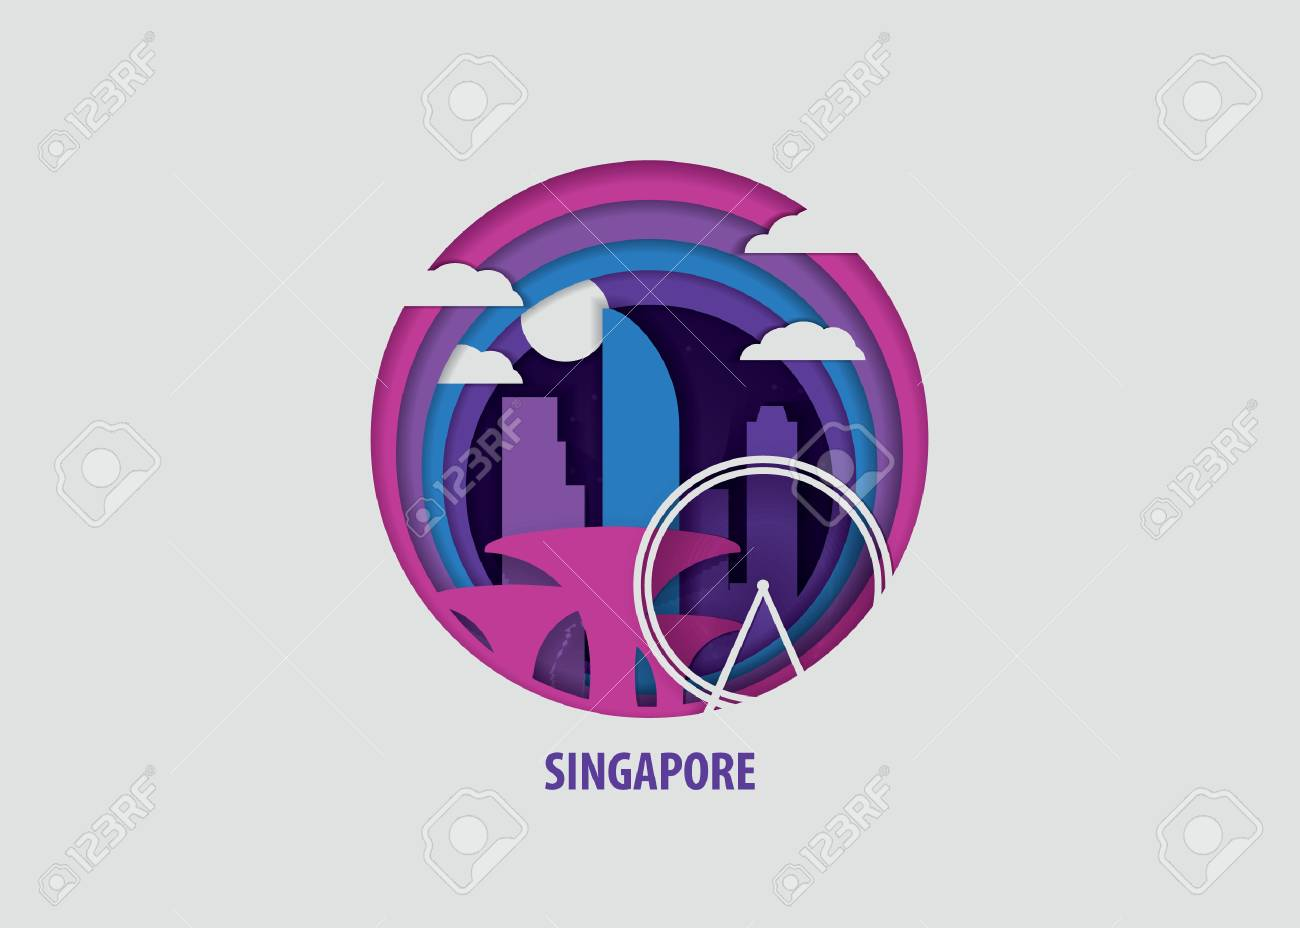 ORIGAMI,KIRIGAMI,PAPER ARTIST AND DESIGNER IN SINGAPORE: 2012 | 928x1300